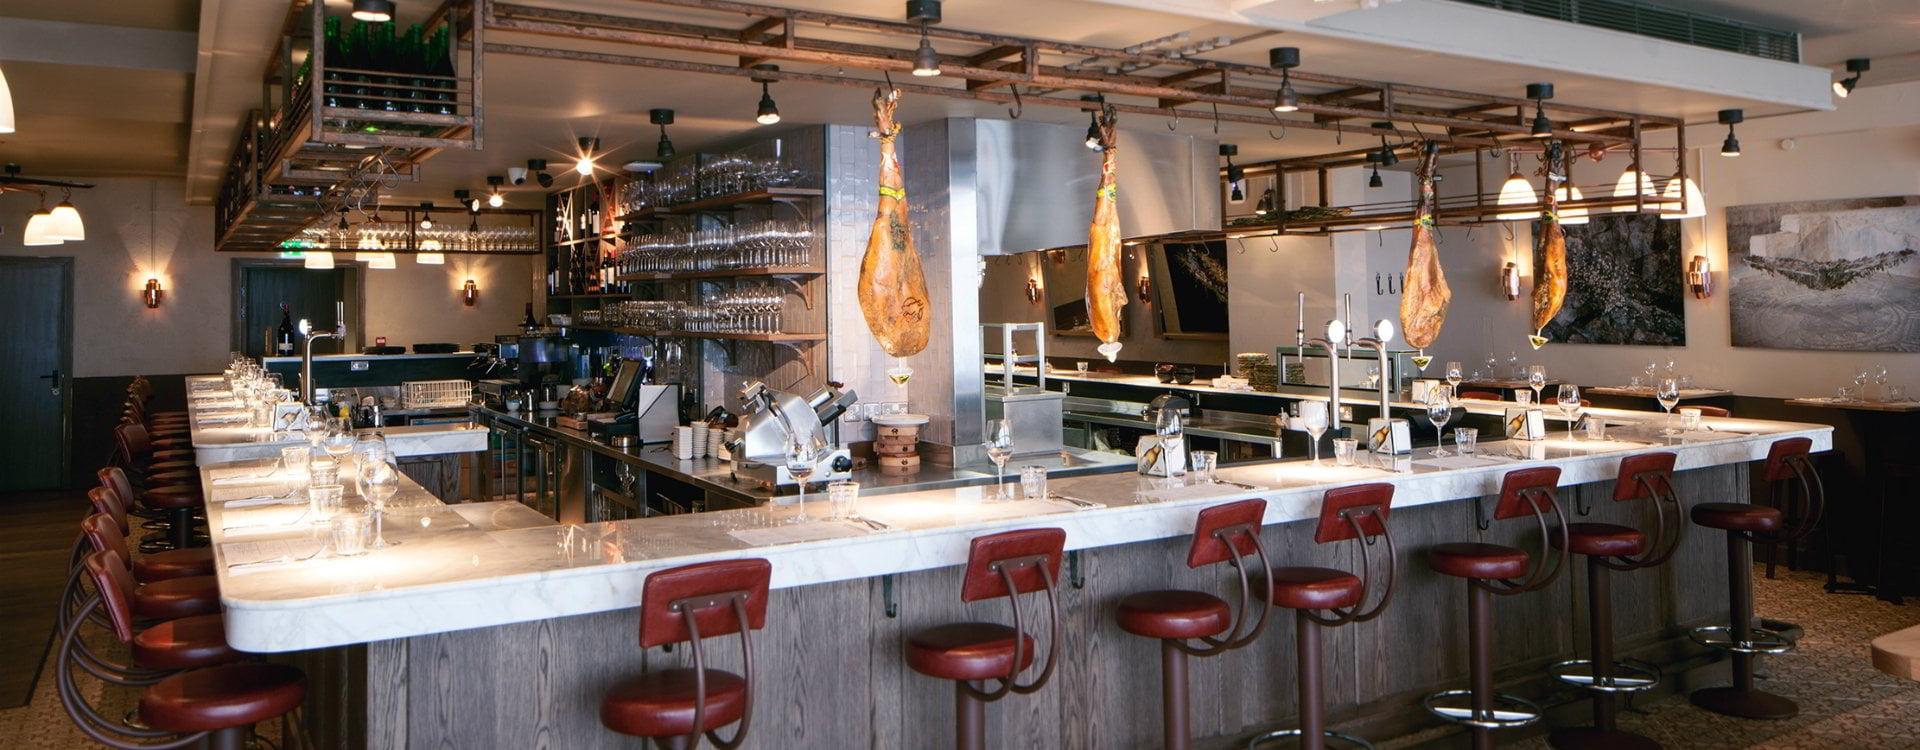 Morada Brindisa Asador Spanish Fare Roasted Over Charcoal Inside An Open Kitchen